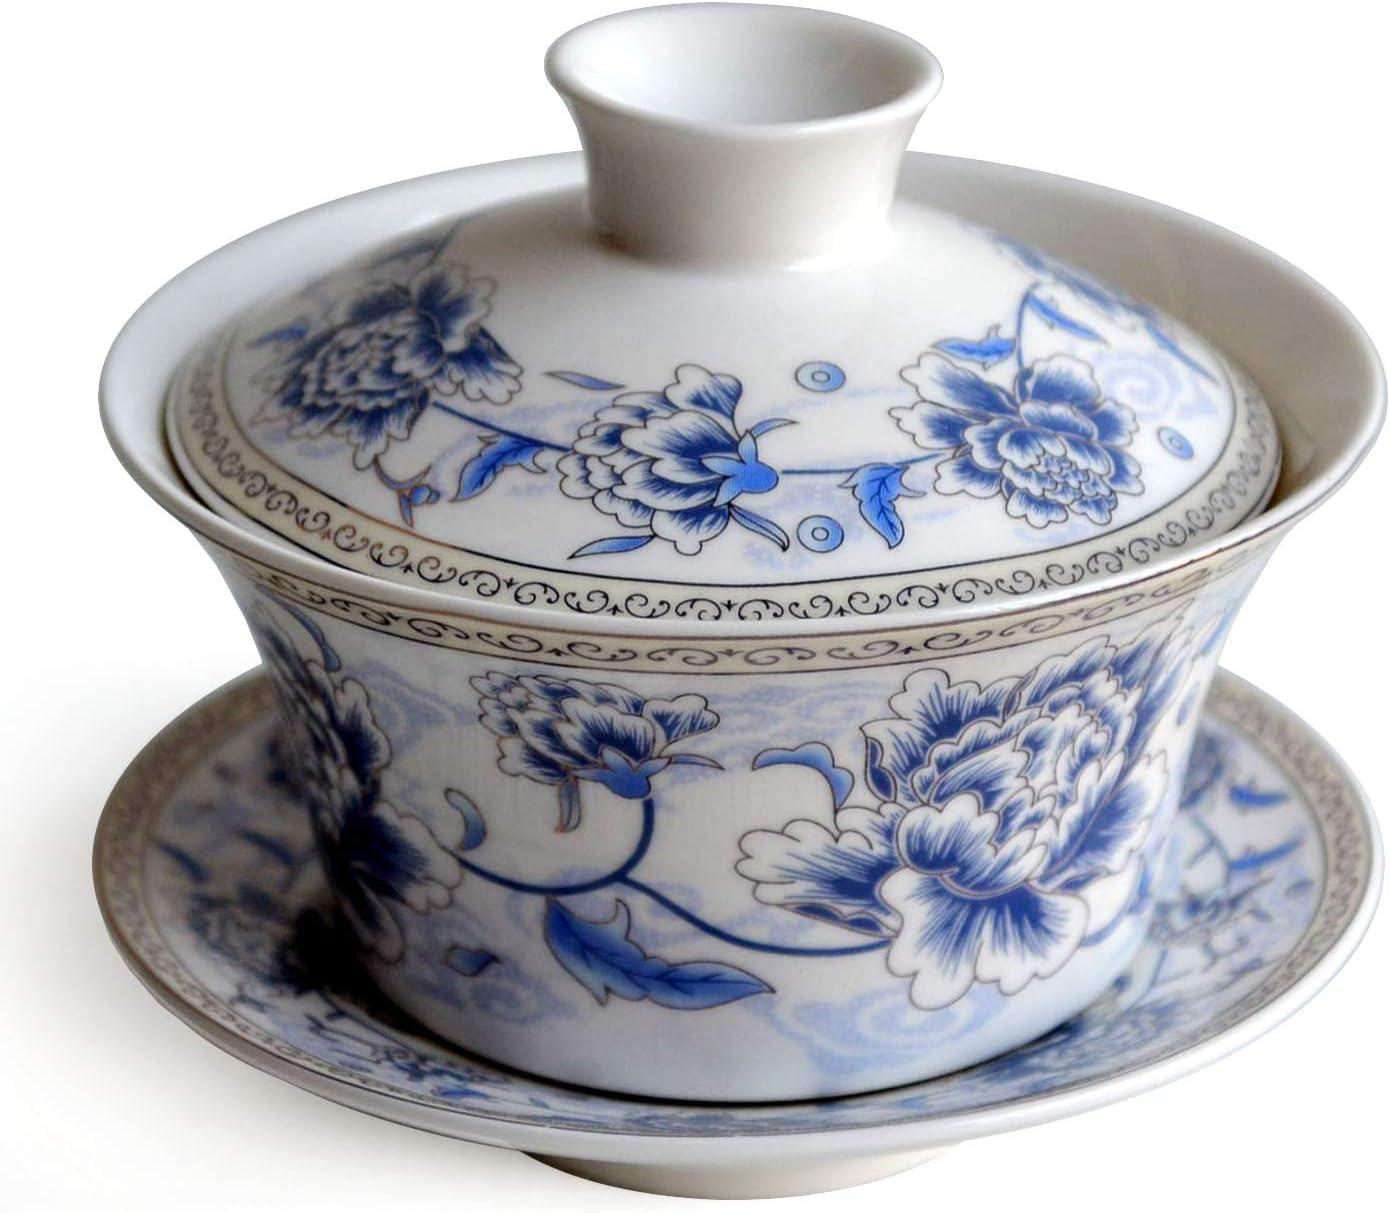 Chinese Porcelain Teacups 6.7oz Gaiwan Flower Tureen Tradition Sancai Cover Bowl Lip Cup Saucer Tea Set for Dry fruit Loose tea Espresso 200ml Blue silk peony